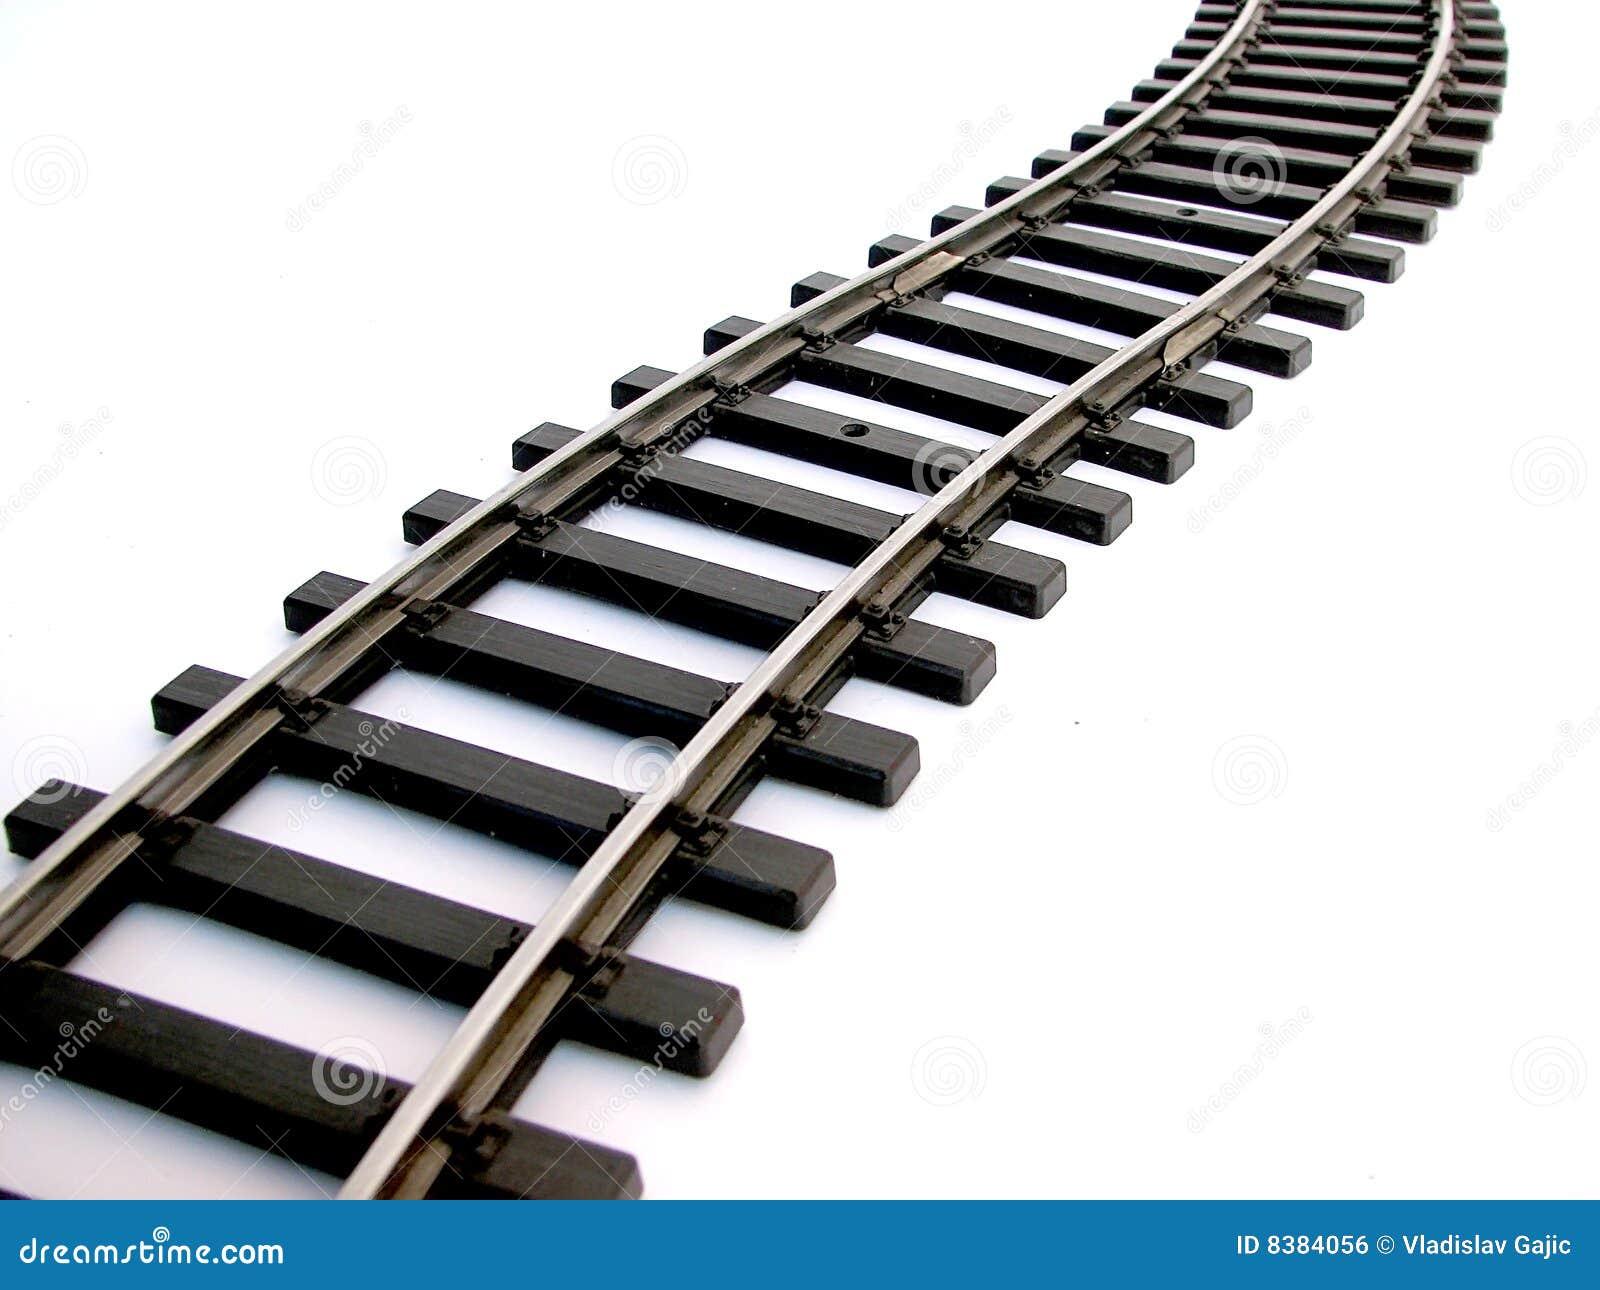 rail track royalty free stock image image 8384056 railroad tracks clip art black and white railroad tracks clip art black and white